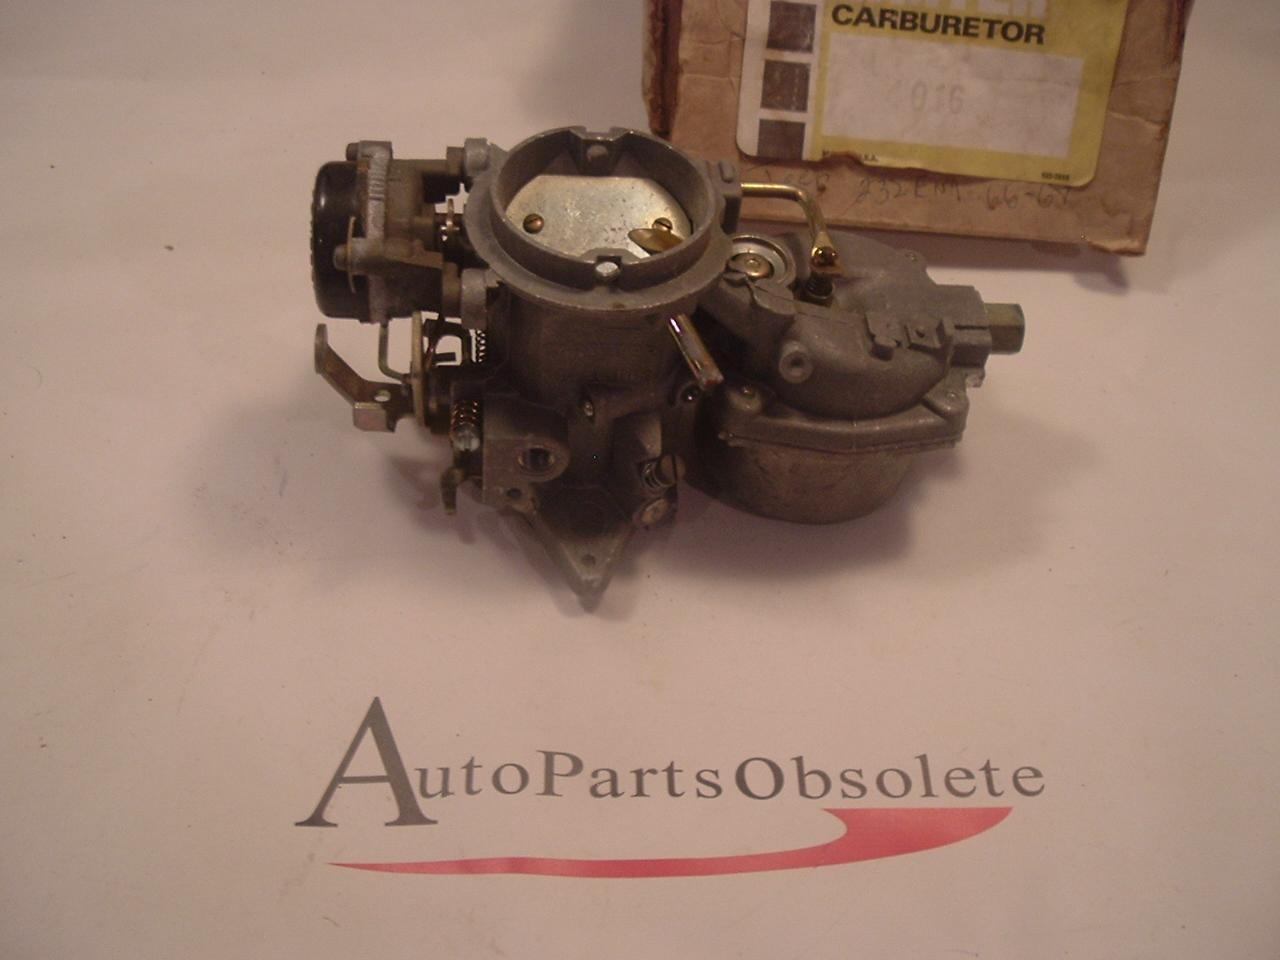 1965 -71 Jeep carburetor 232 6cyl nos carter #4016 (a 4016)